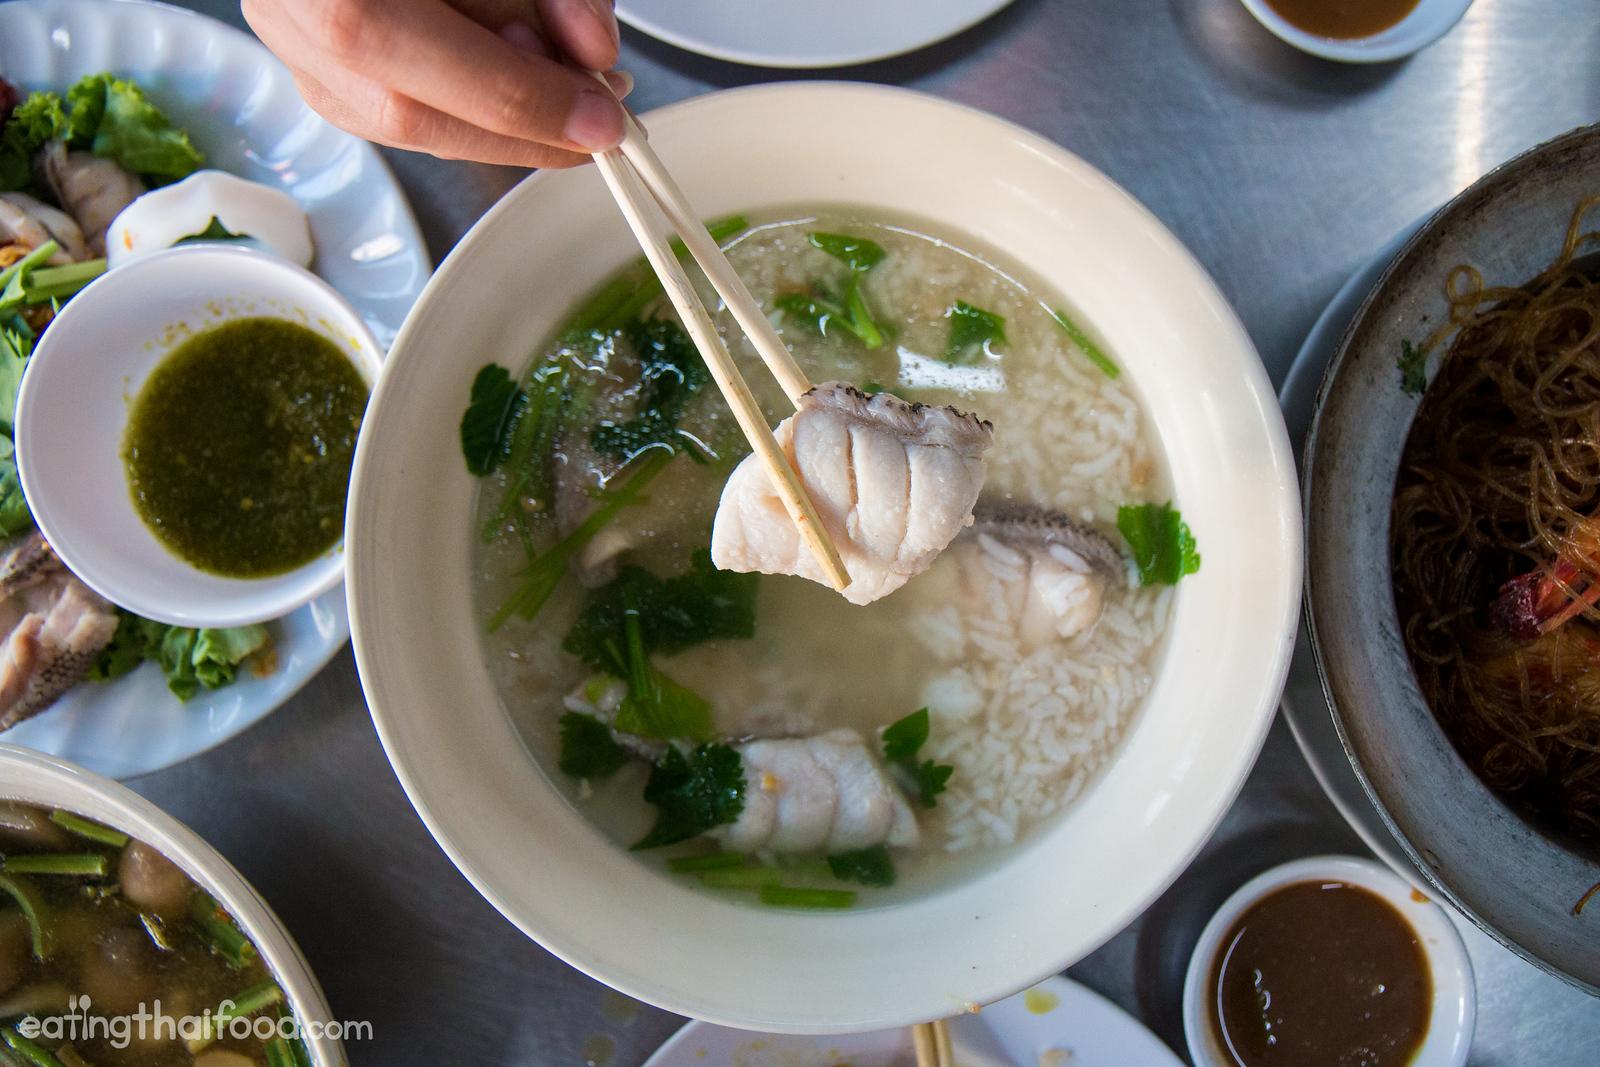 Hia Wan Khao Tom Pla (ร้านเฮียหวานข้าวต้มปลา)